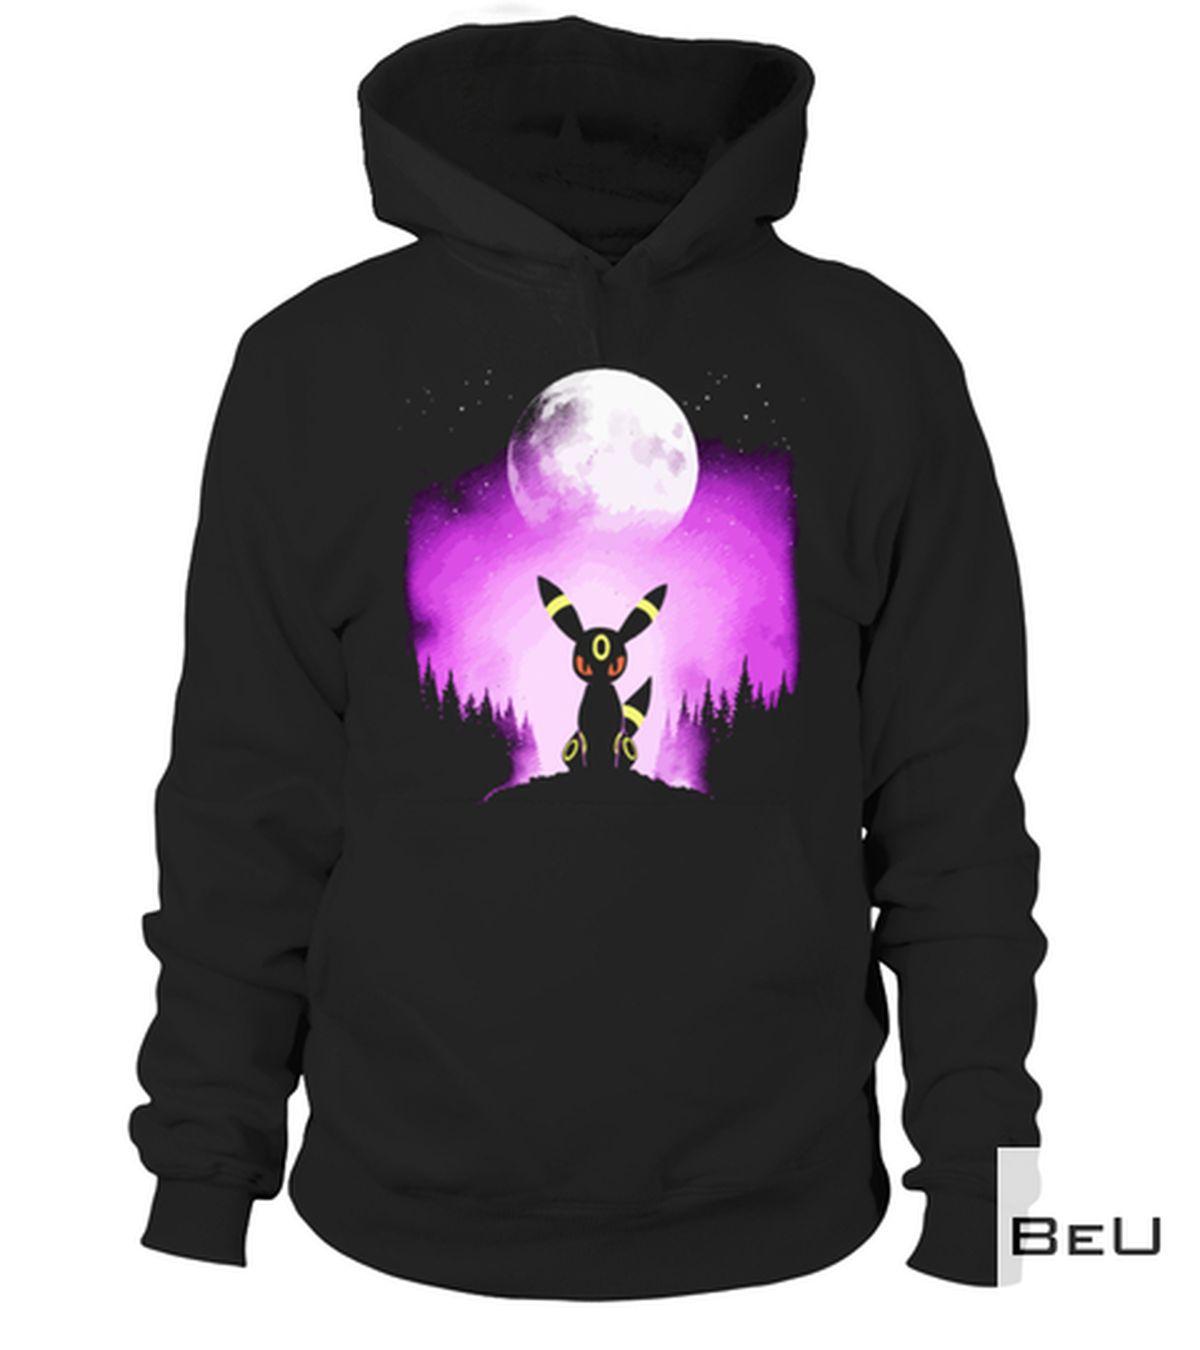 Official Umbreon Pokemon Shirt, hoodie, tank top